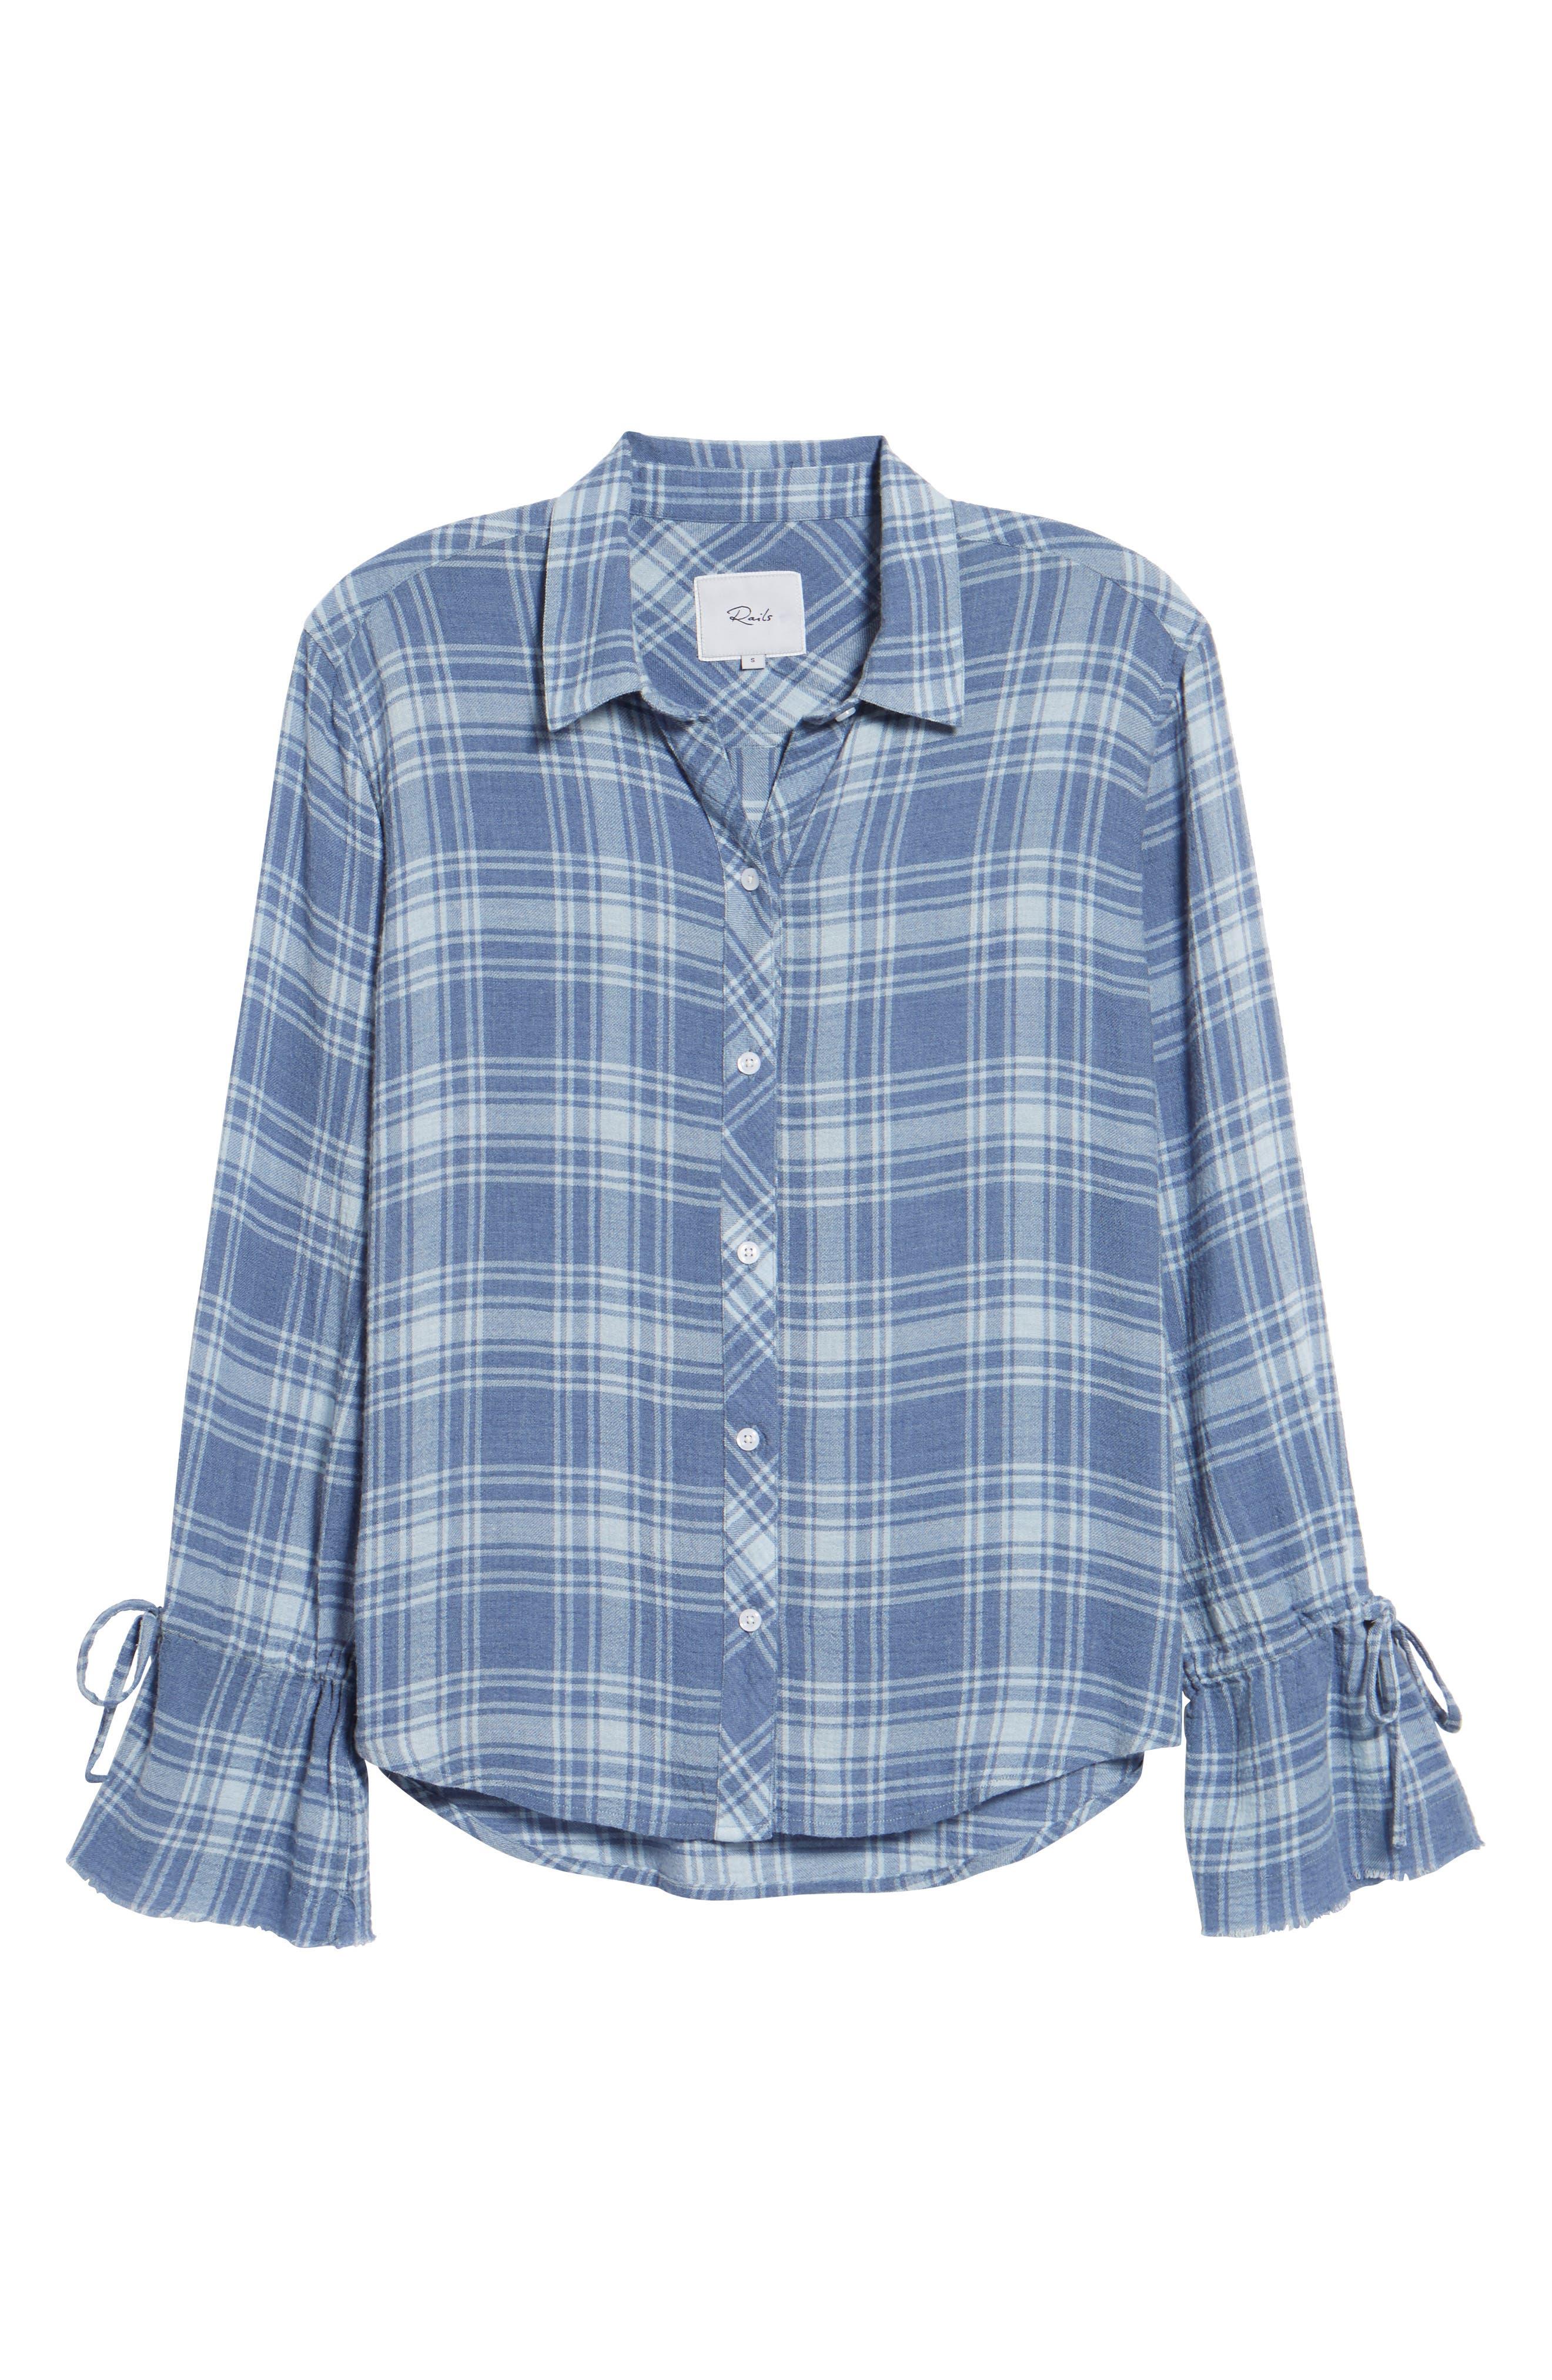 Astrid Tie Cuff Shirt,                             Alternate thumbnail 6, color,                             464